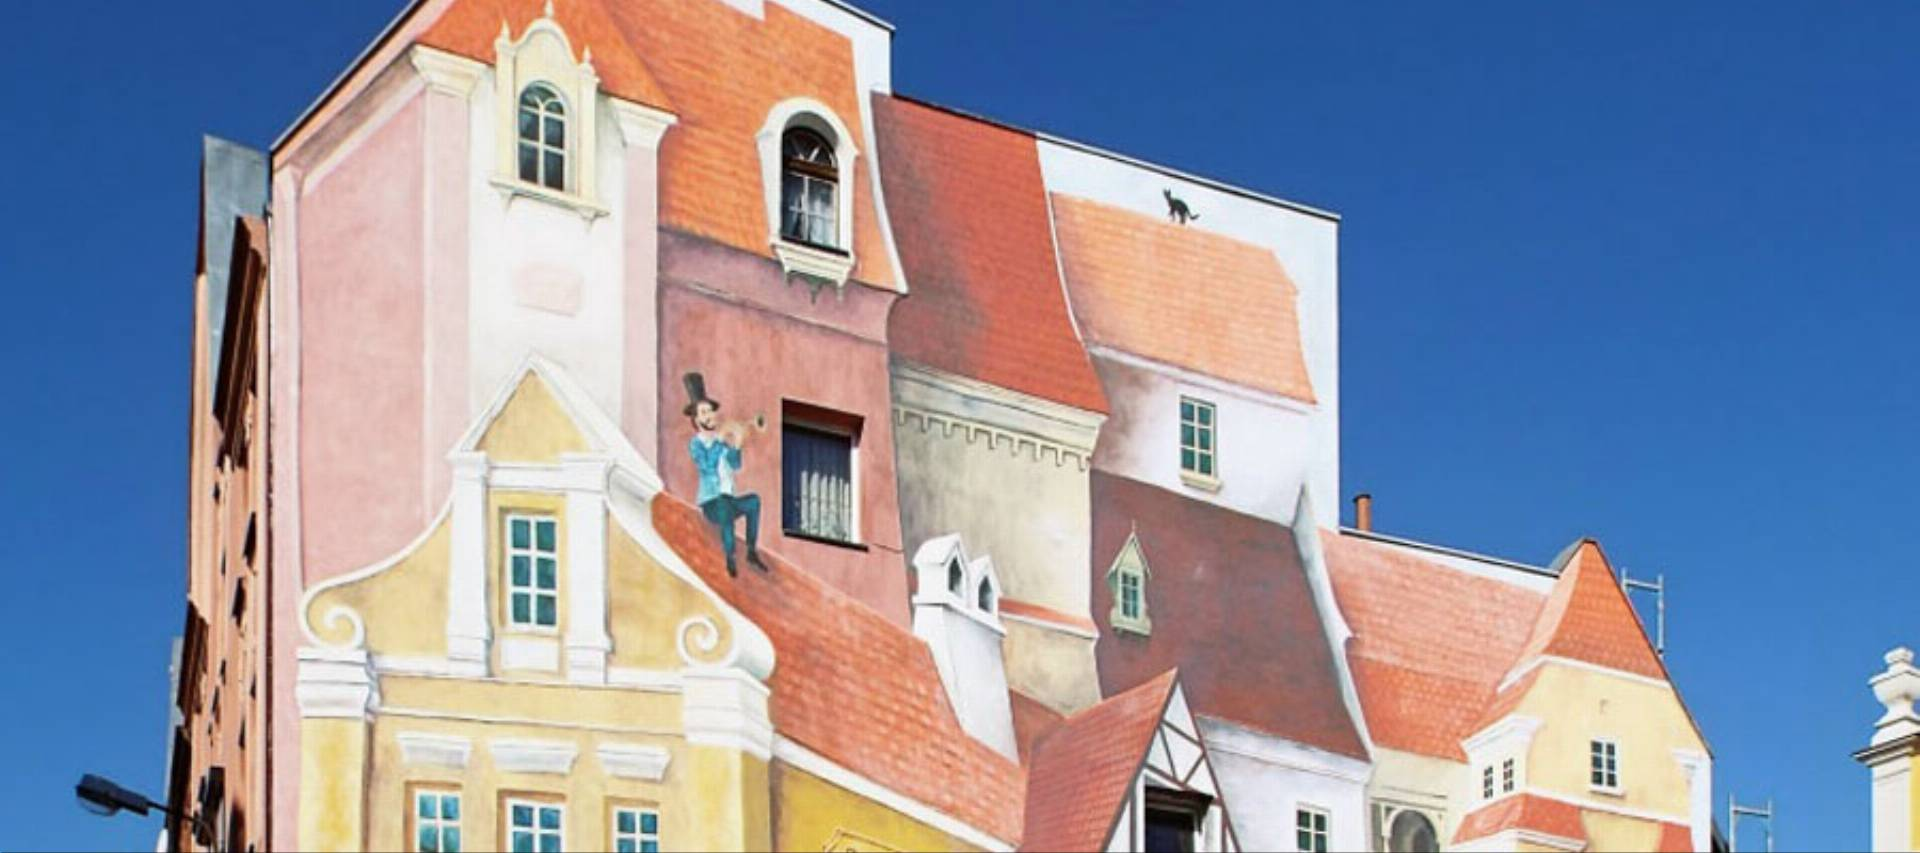 mural_Poznań_pl.wikipedia.org log